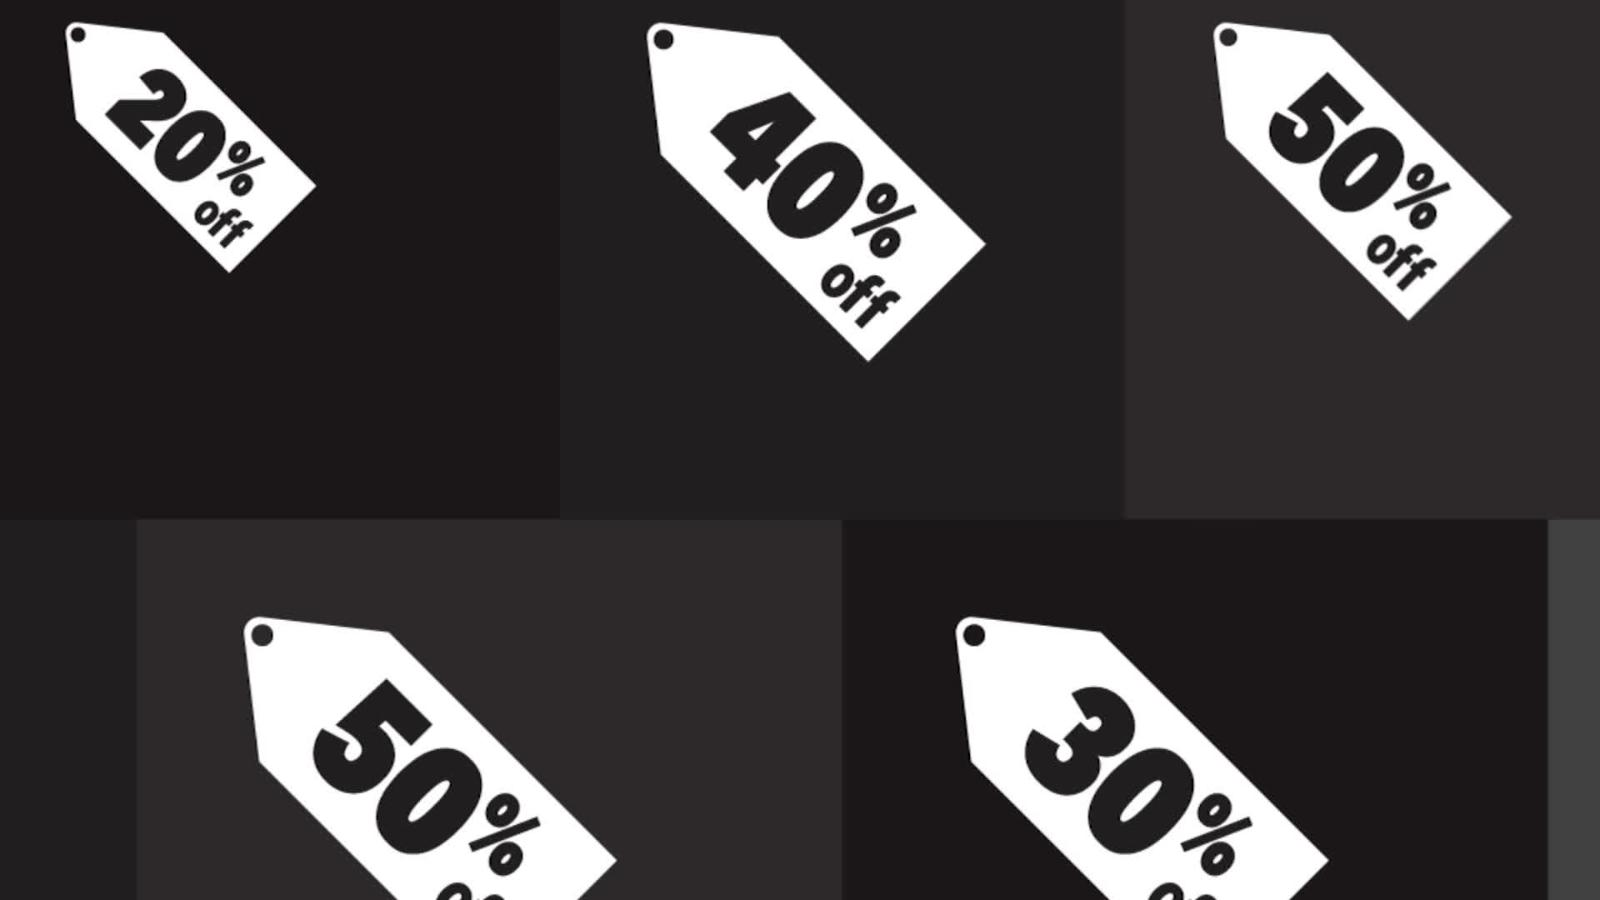 Blockbuster Black Friday could follow $4.2B Thanksgiving online shopping  feast - CNN